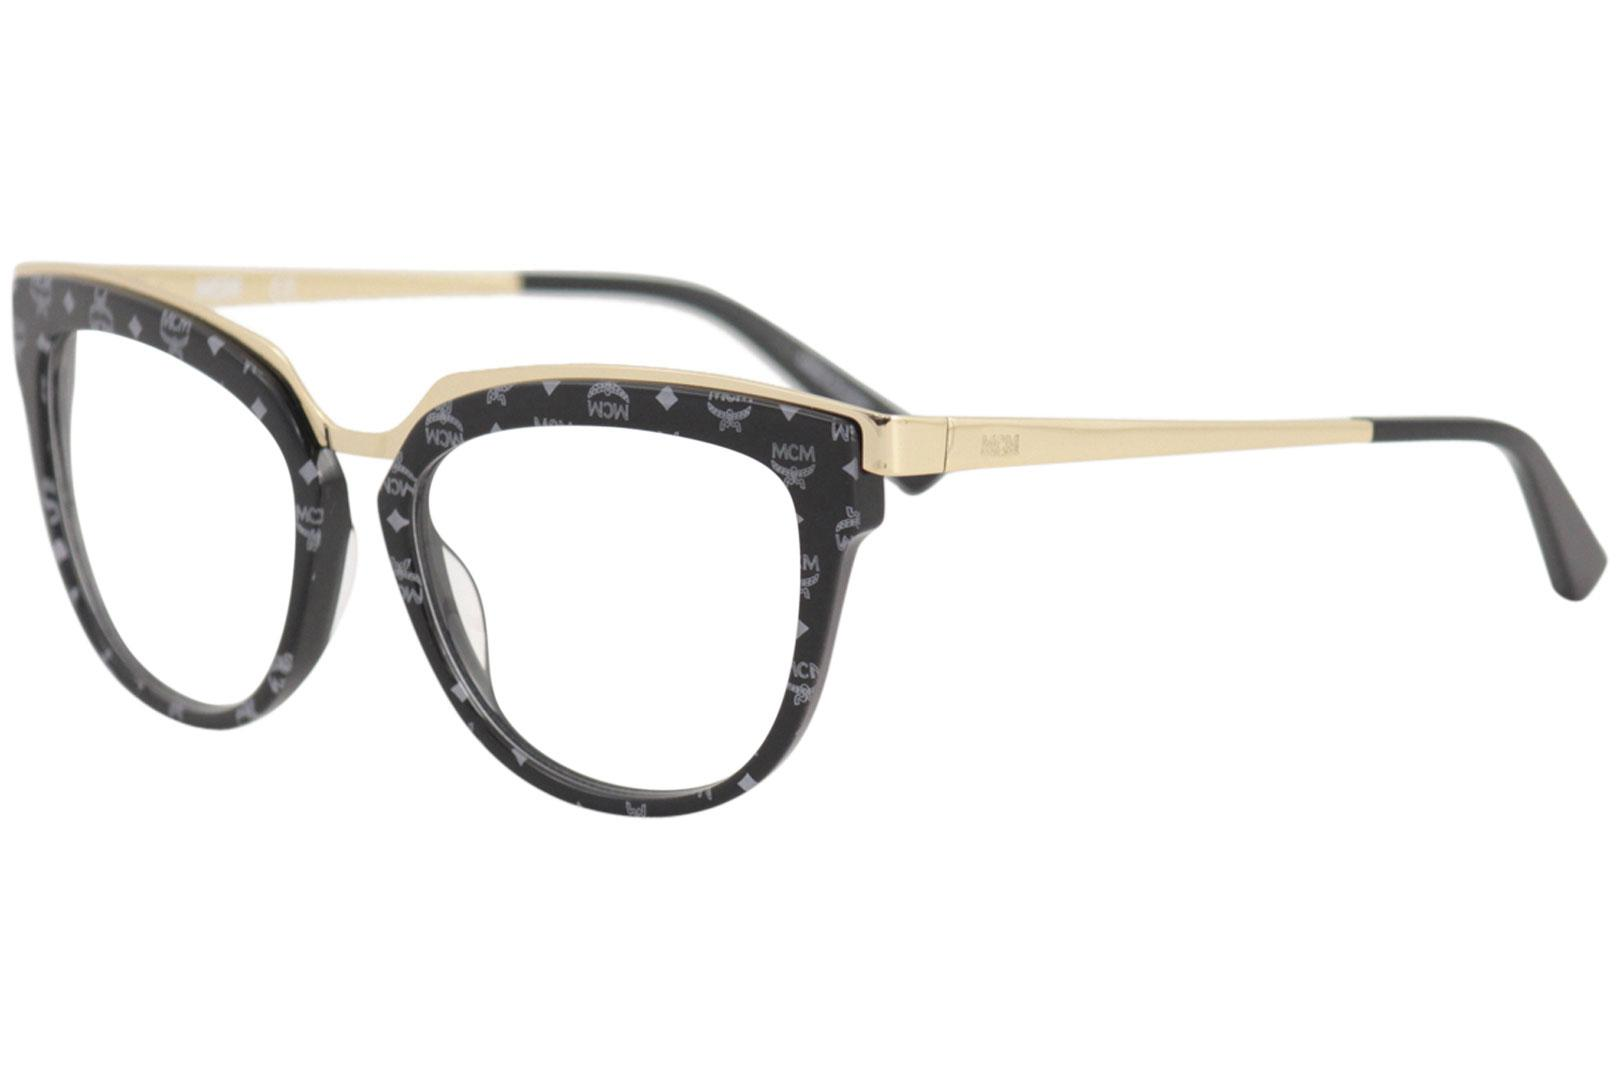 d73dca4c922 MCM Men s Eyeglasses MCM2623 2623 Full Rim Optical Frame by MCM. 12345